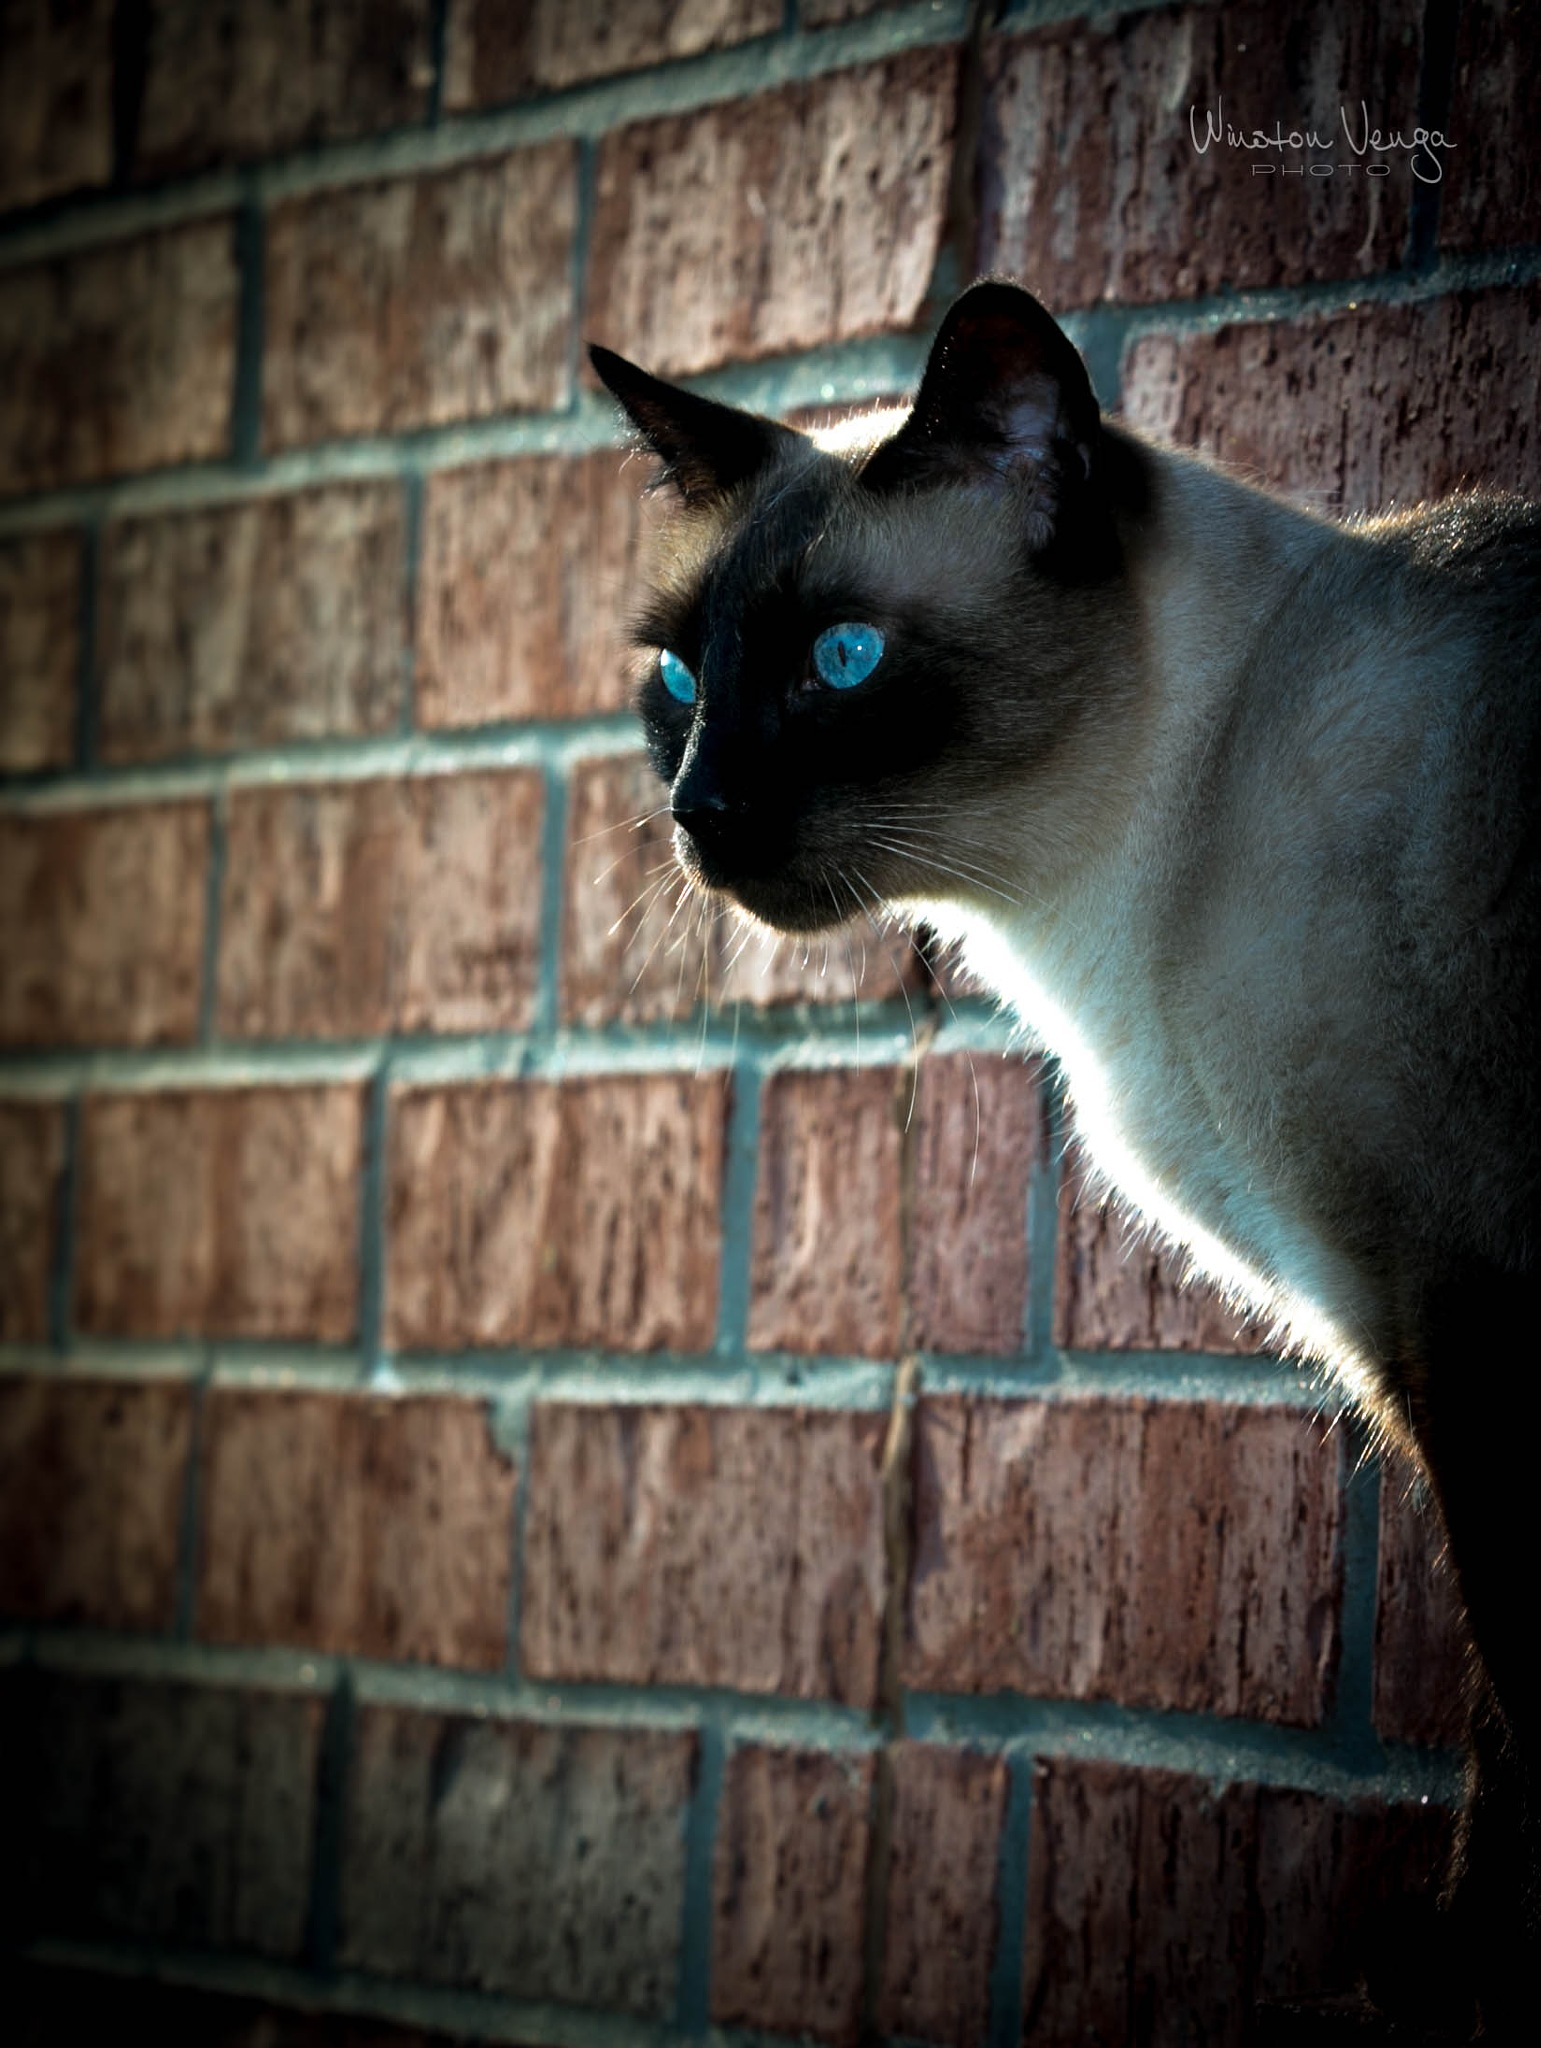 Gato na Parede de Tijolos by Winston Venga